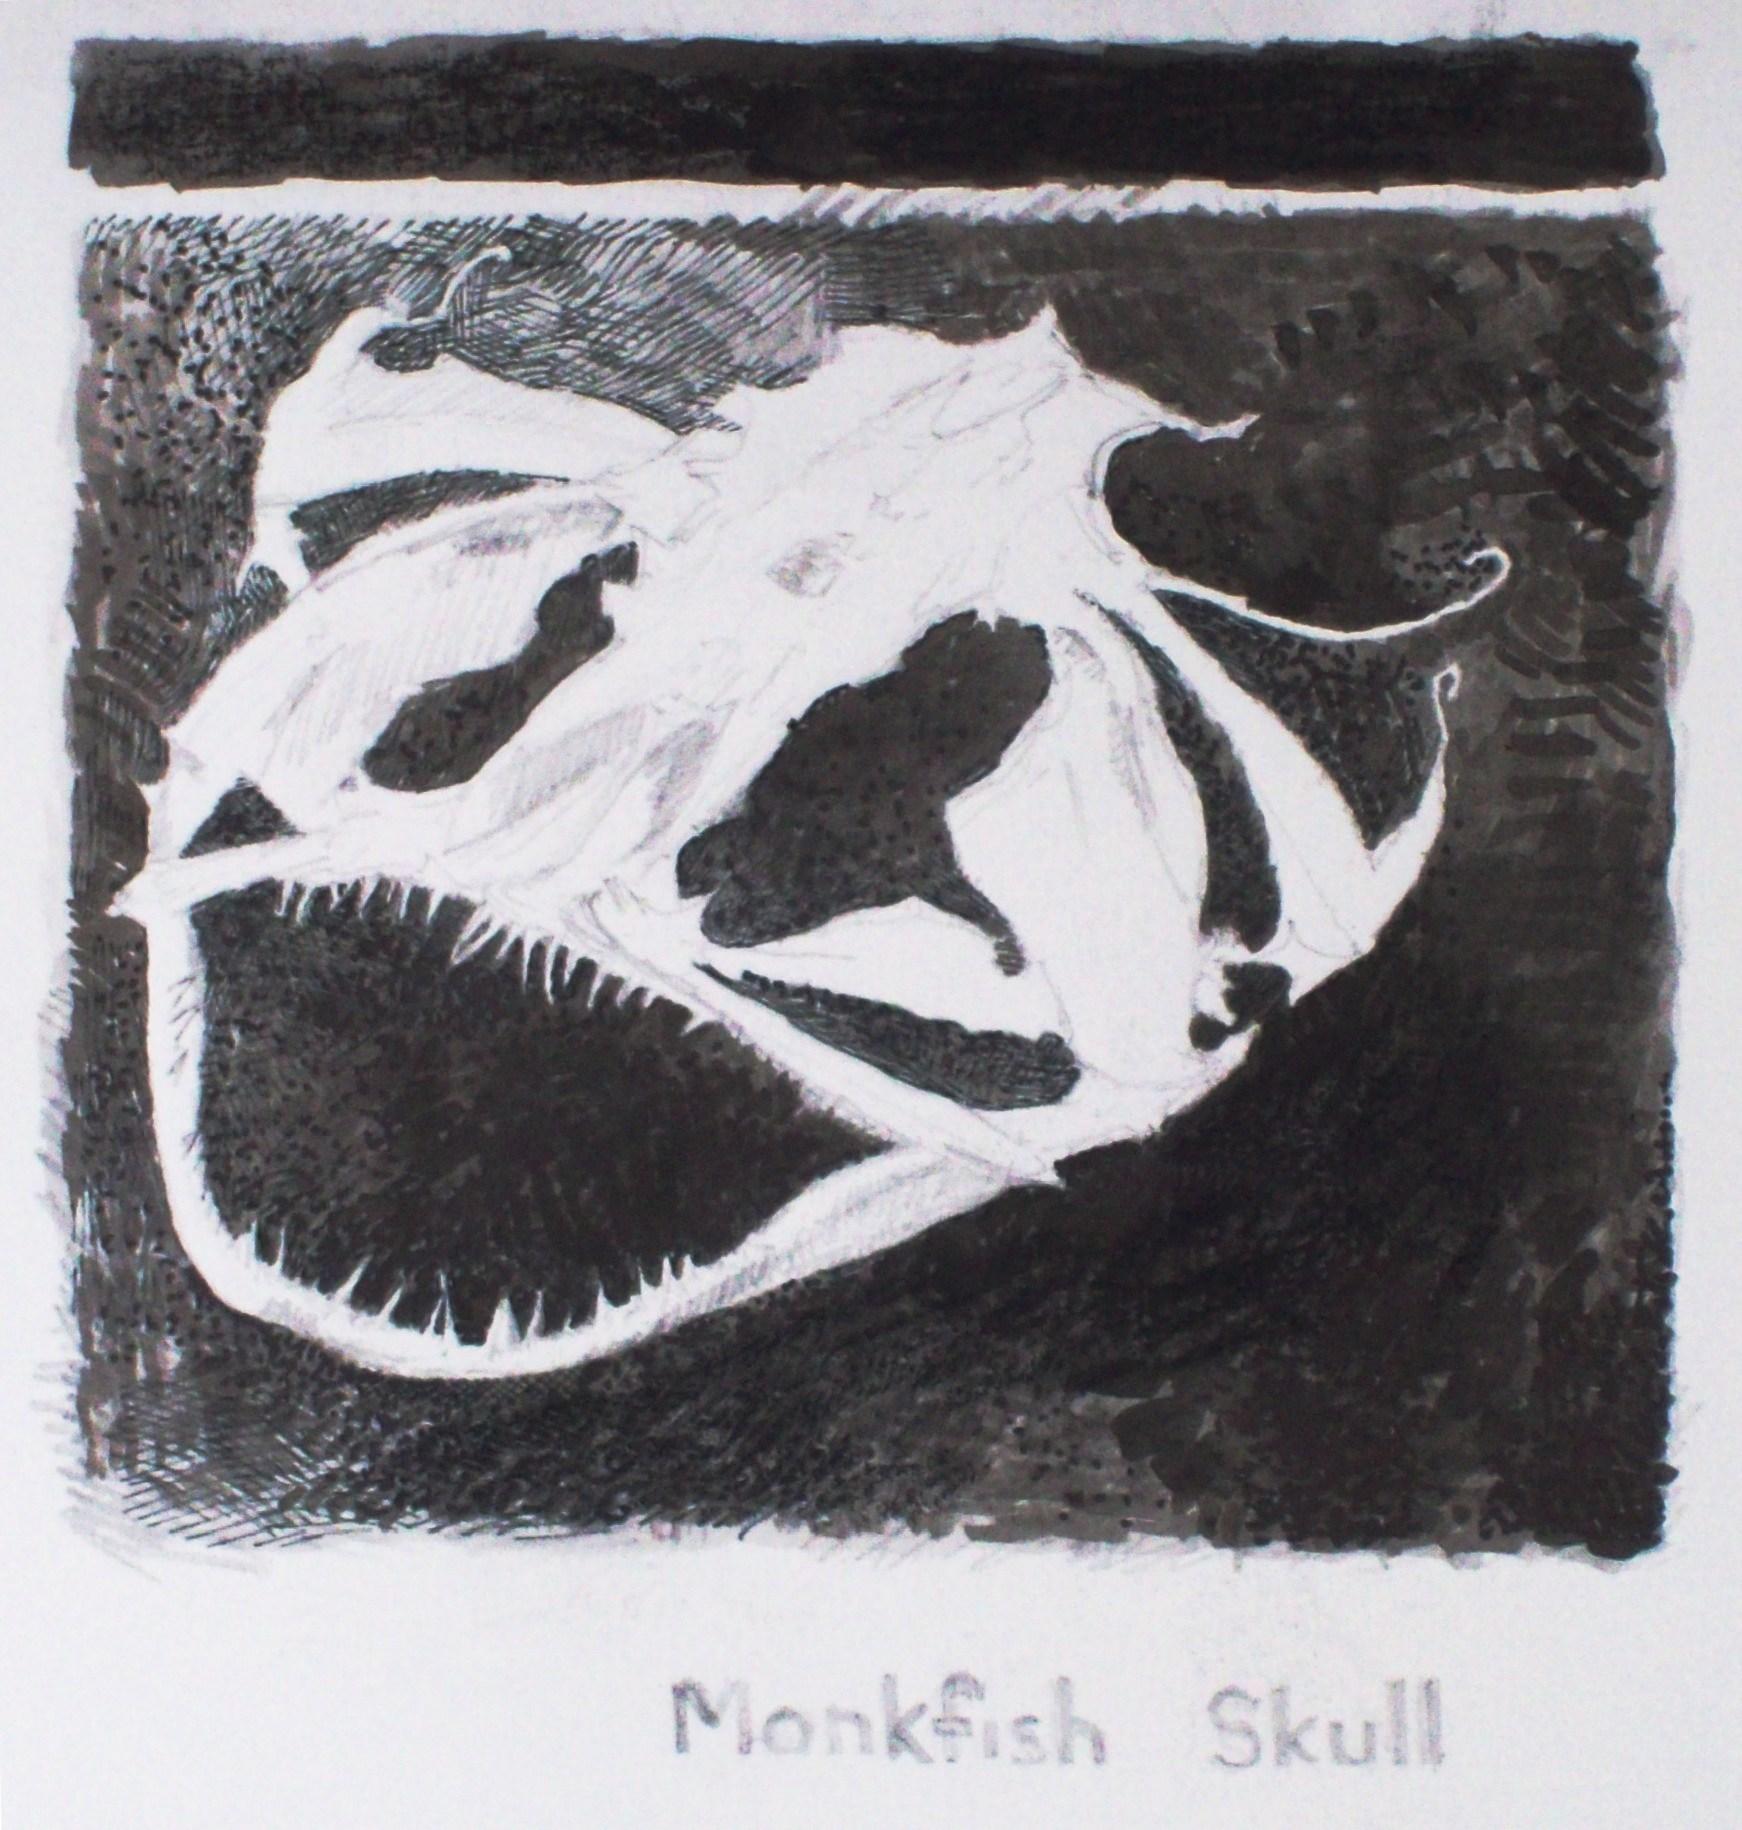 monkfish skull